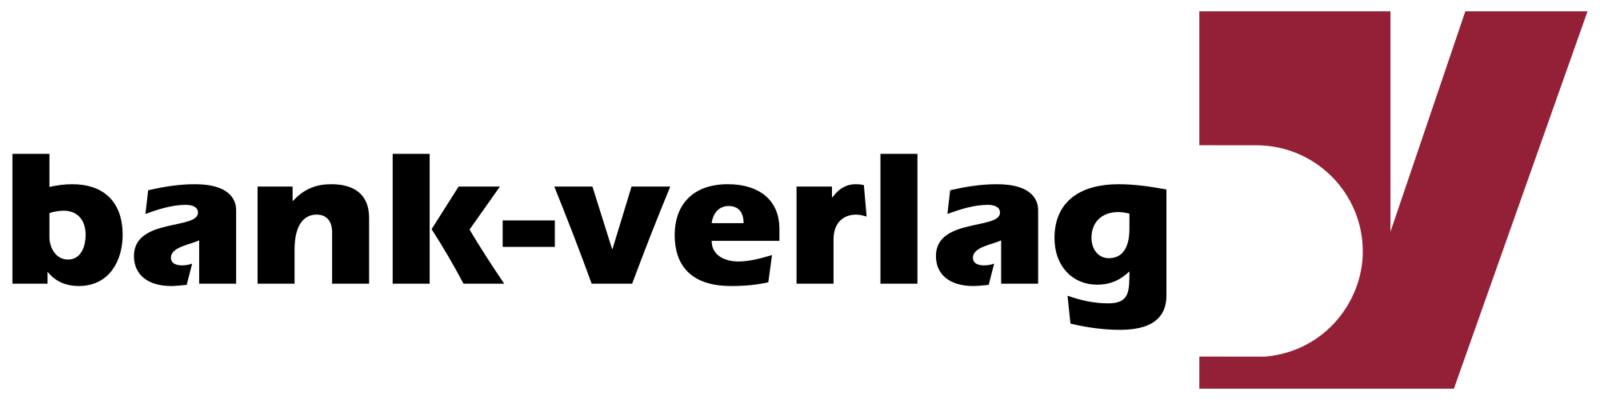 bank verlag logo